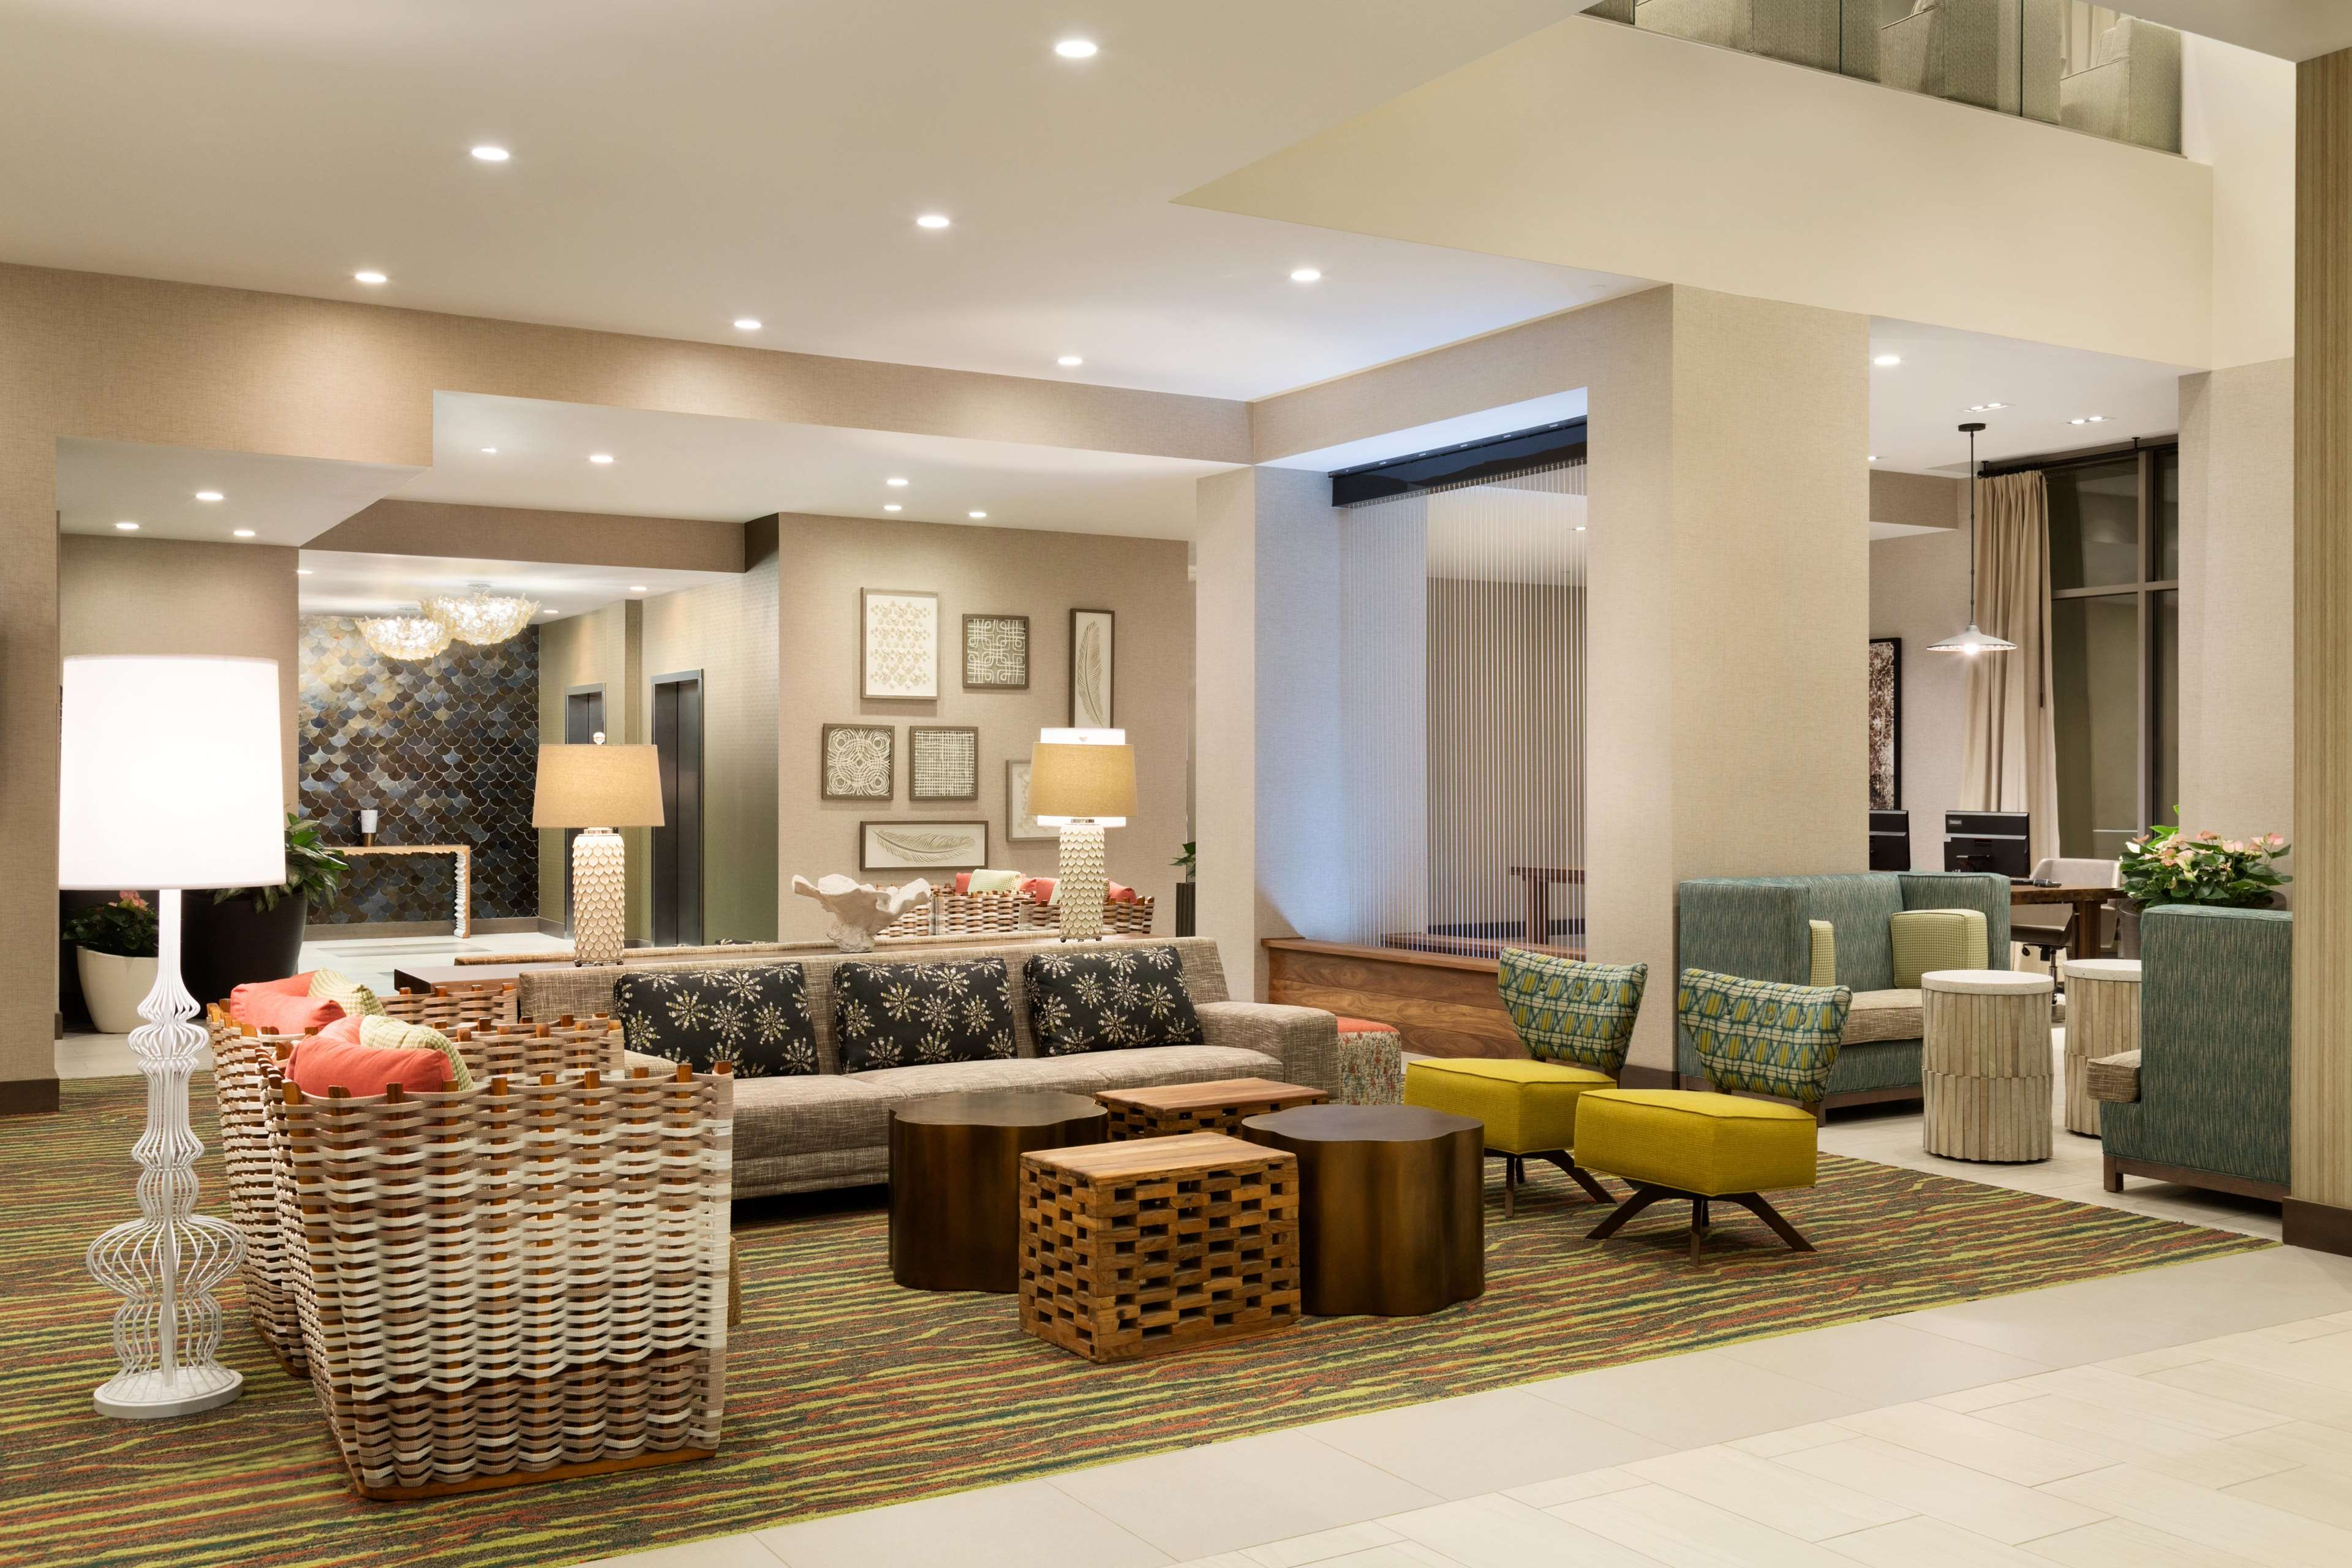 Embassy Suites by Hilton Oahu Kapolei image 9